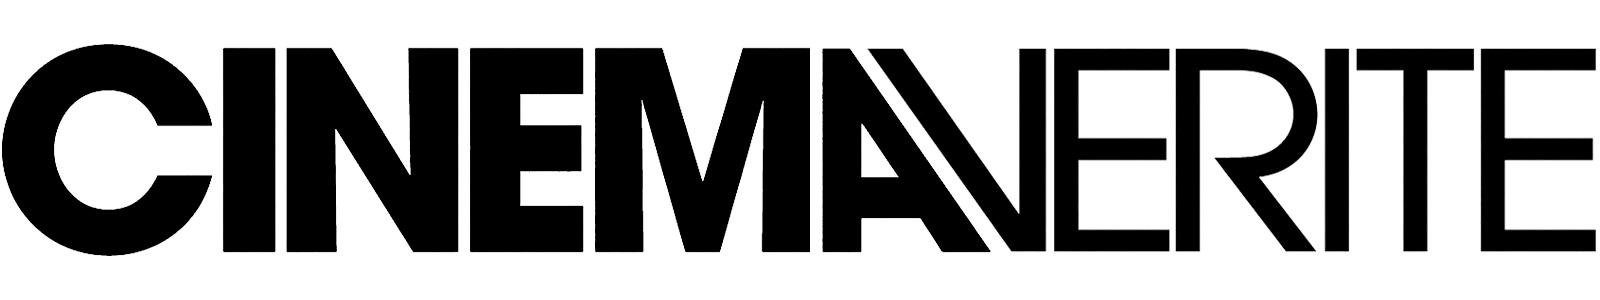 Cinema-Verite_logo.jpg